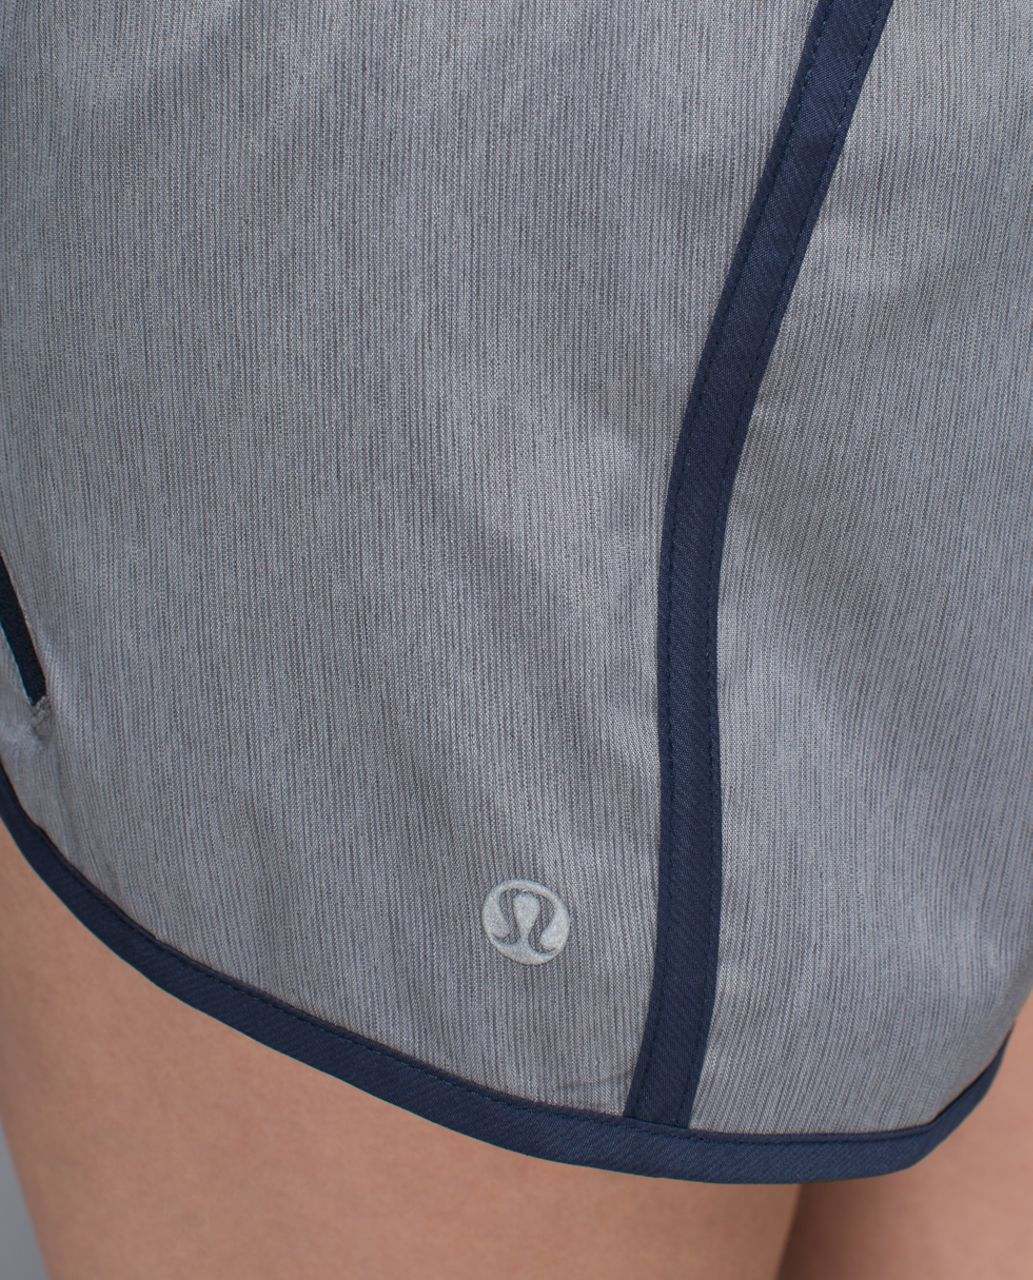 Lululemon Tracker Short II *4-way Stretch - Heathered Slate / Inkwell / West2east Stripe Inkwell Heathered Medium Grey